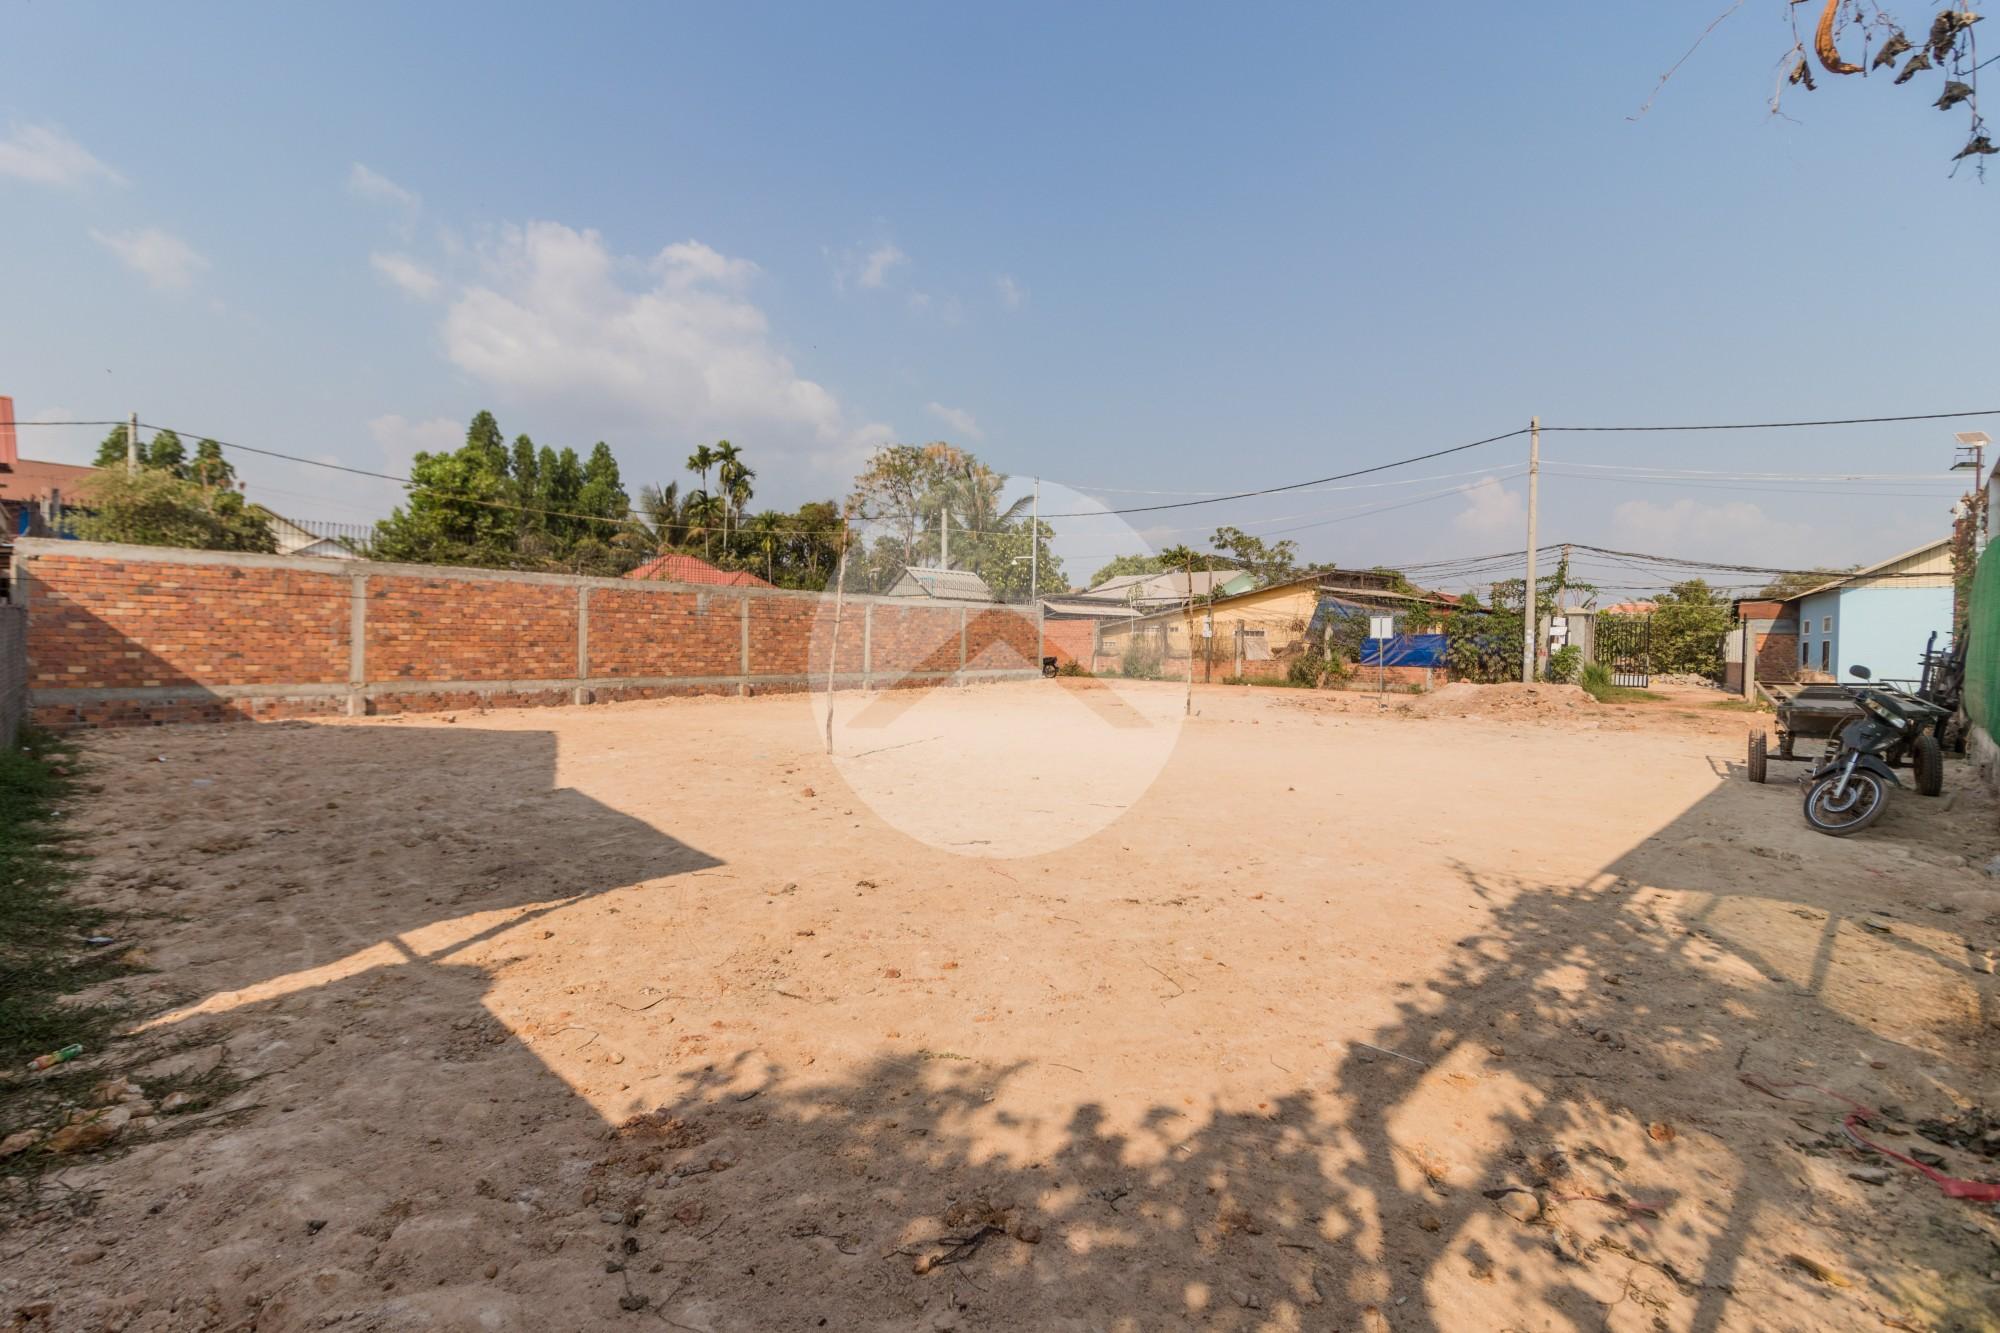 230 Sqm Residential Land For Sale - Svay Dangkum, Siem Reap